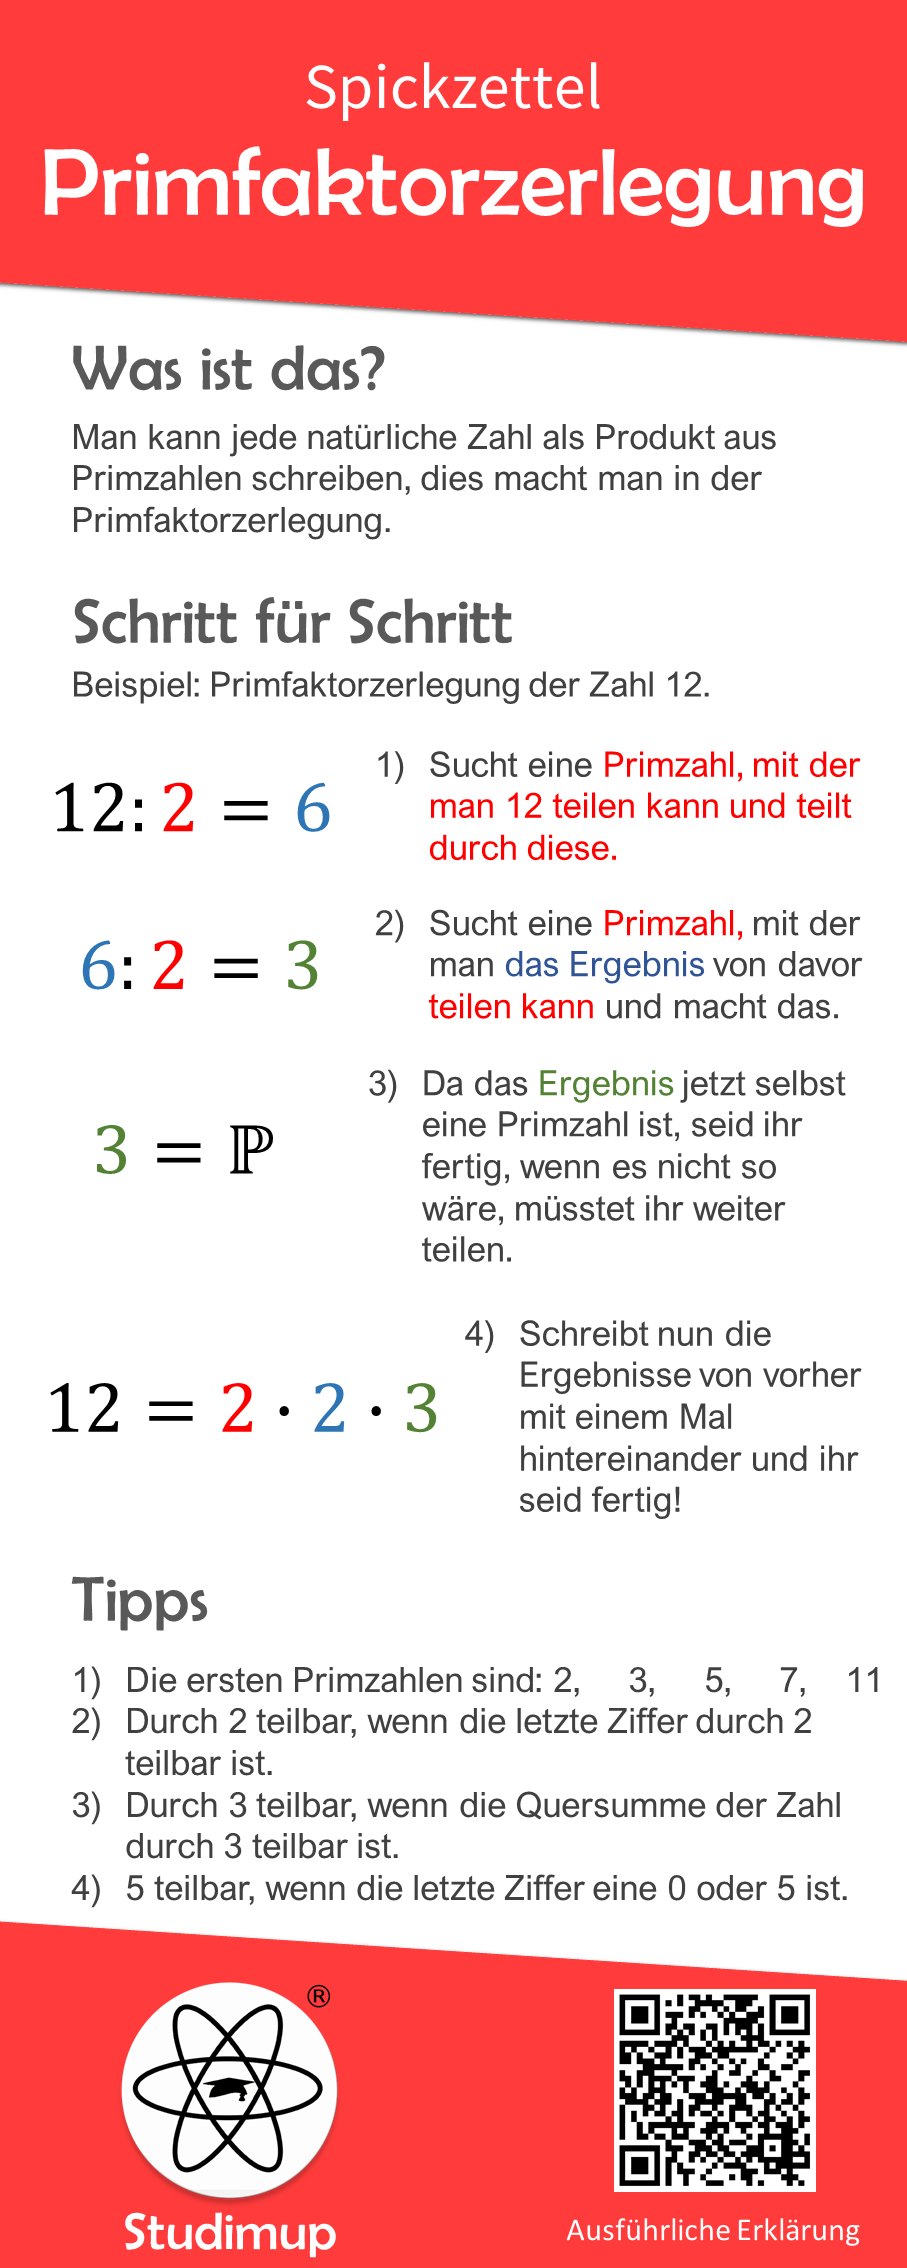 Primfaktorzerlegung Spickzettel Nachhilfe Mathe Primfaktorzerlegung Spickzettel